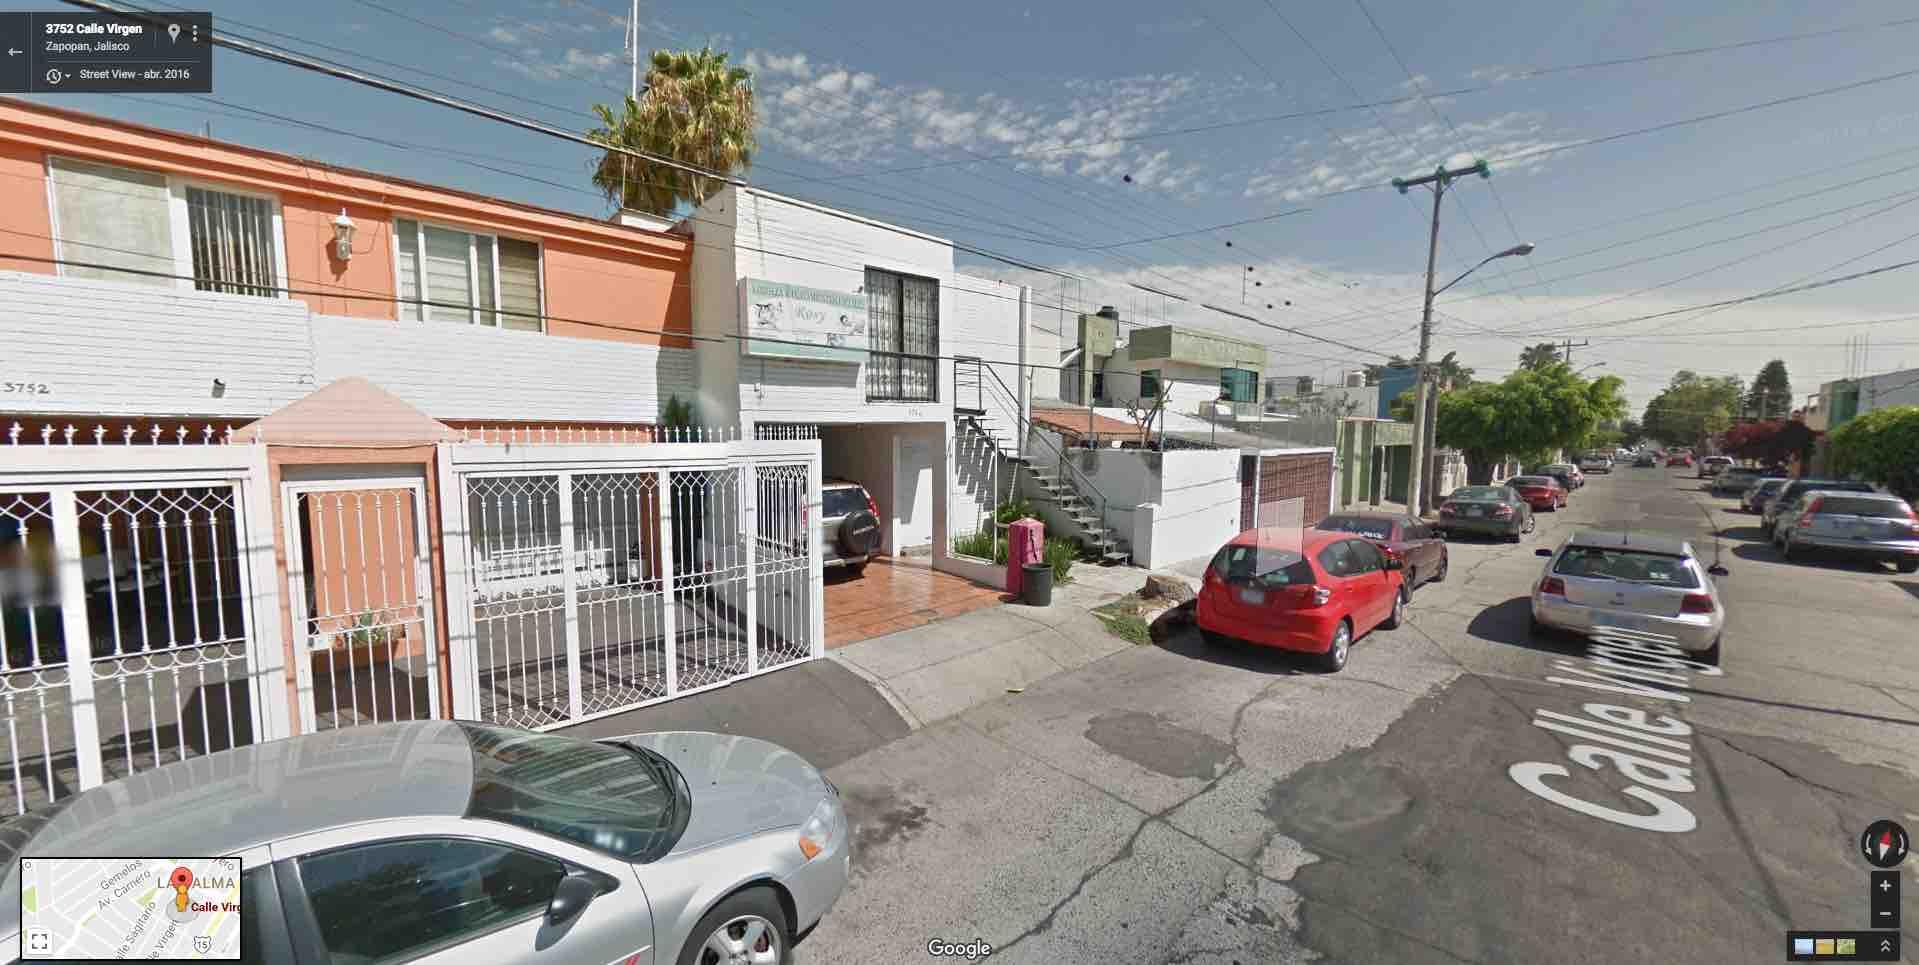 Fracc. La Calma, Calle Virgen 3746